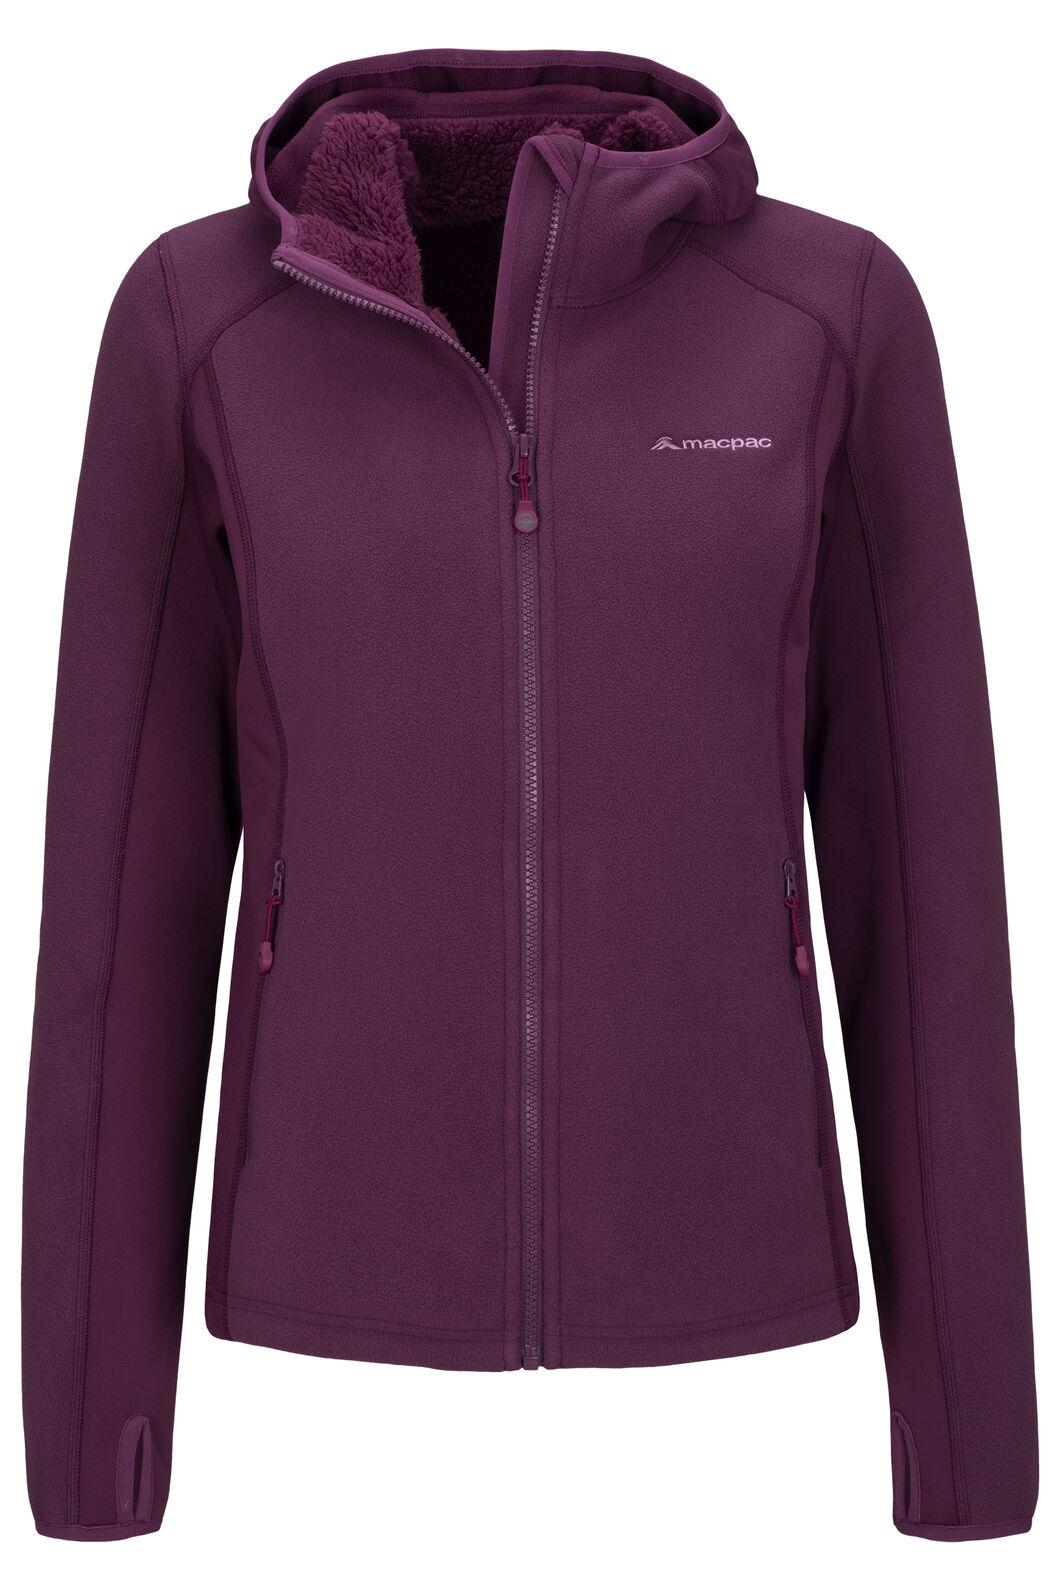 Macpac Mountain Hooded Jacket — Women's, Amaranth, hi-res